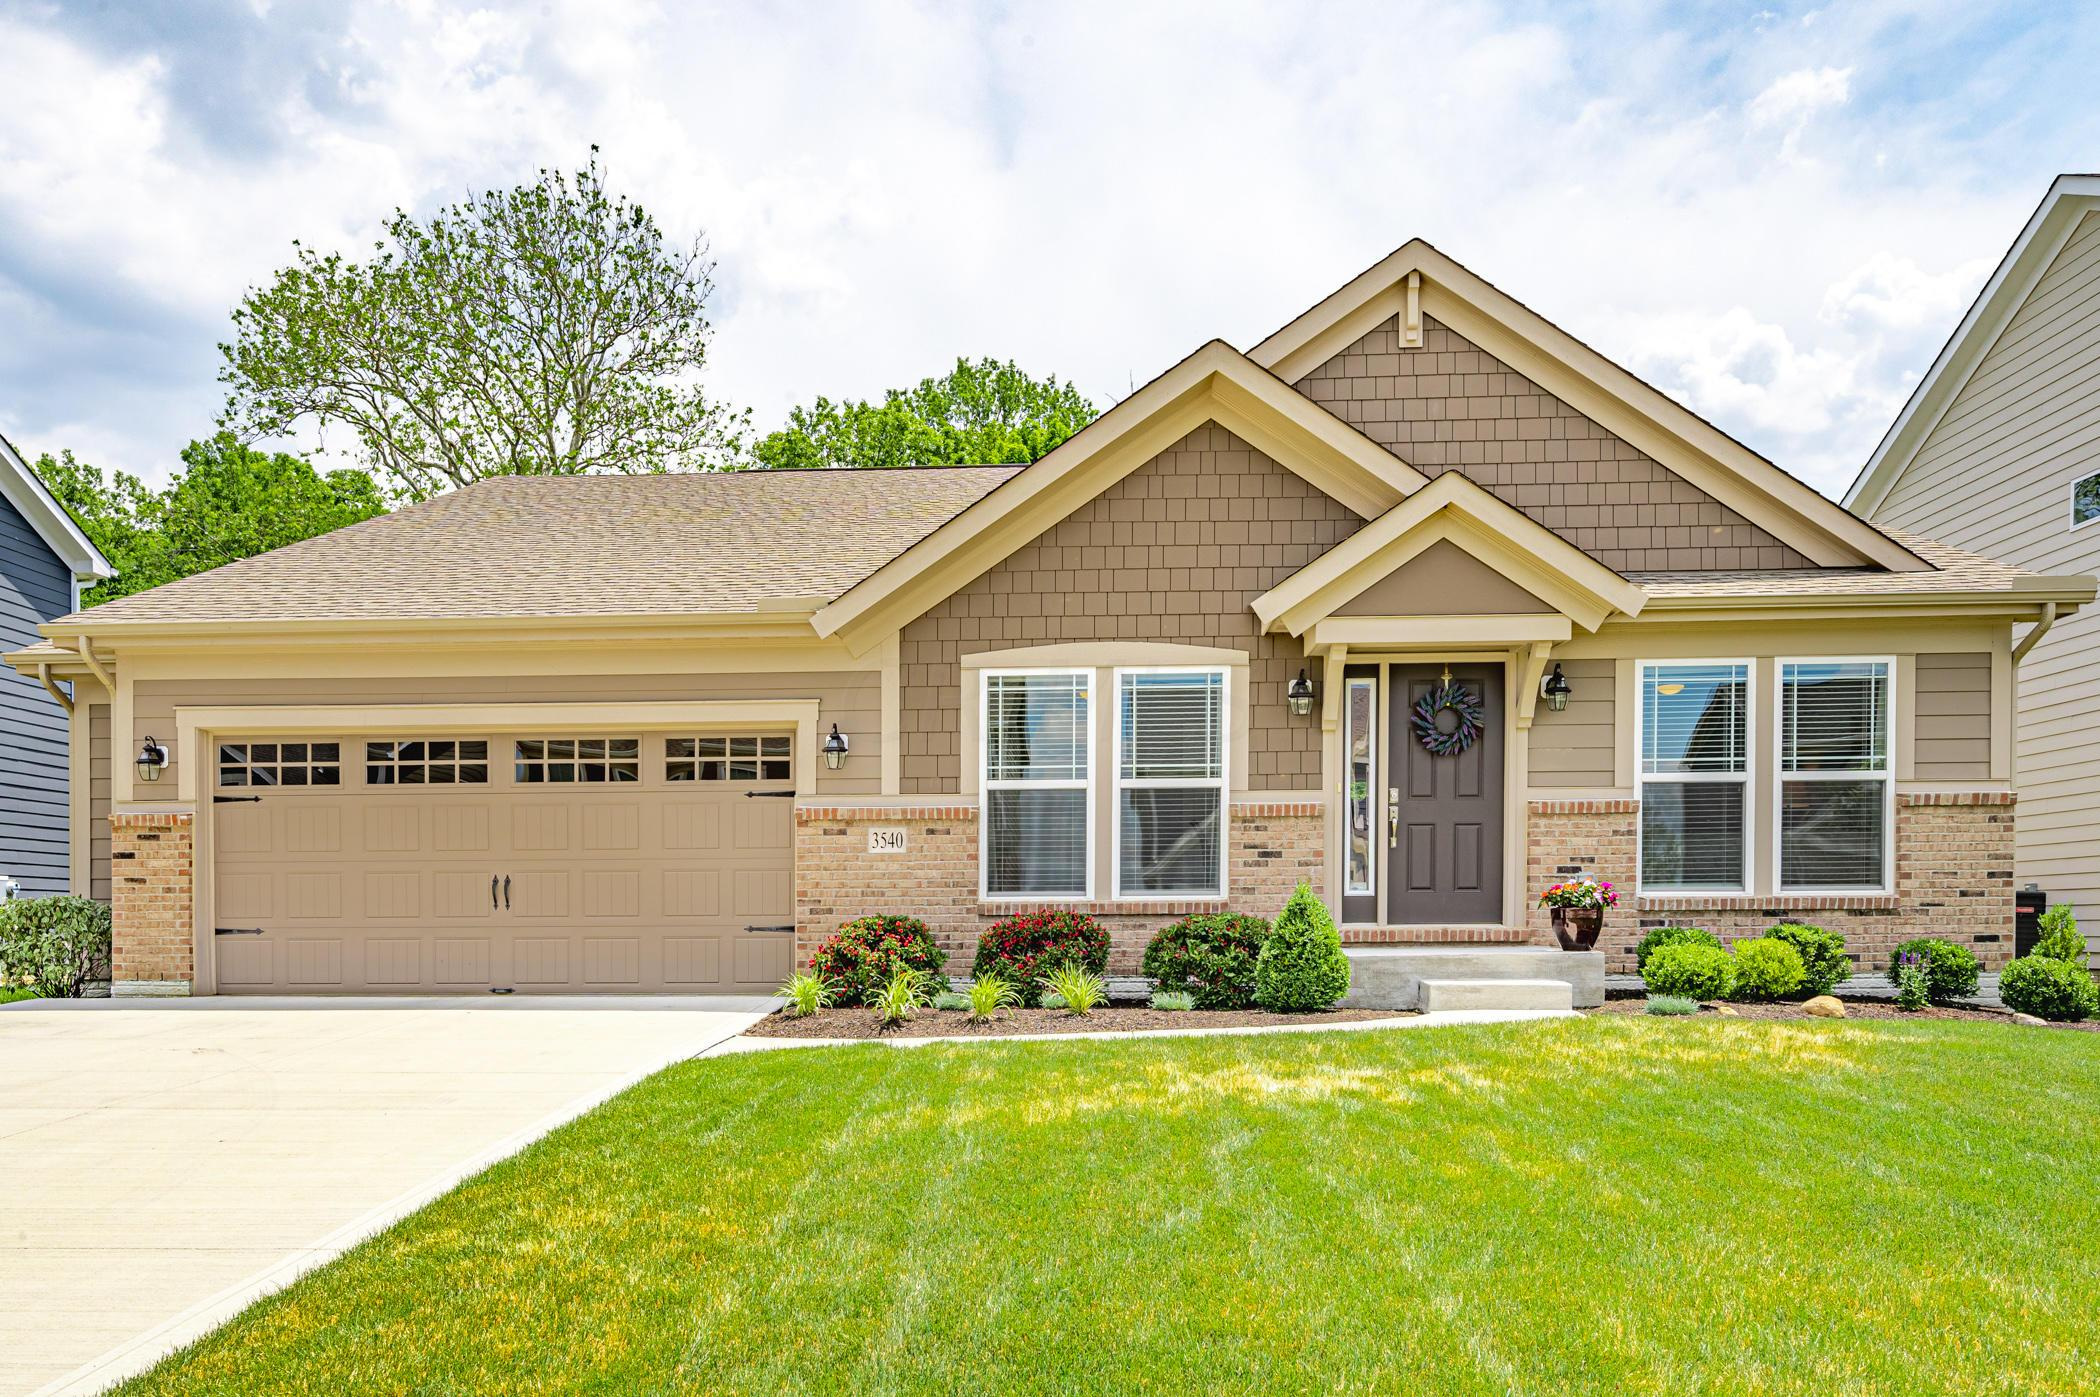 3540 Woodland Drive, Hilliard, Ohio 43026, 3 Bedrooms Bedrooms, ,2 BathroomsBathrooms,Residential,For Sale,Woodland,220019519